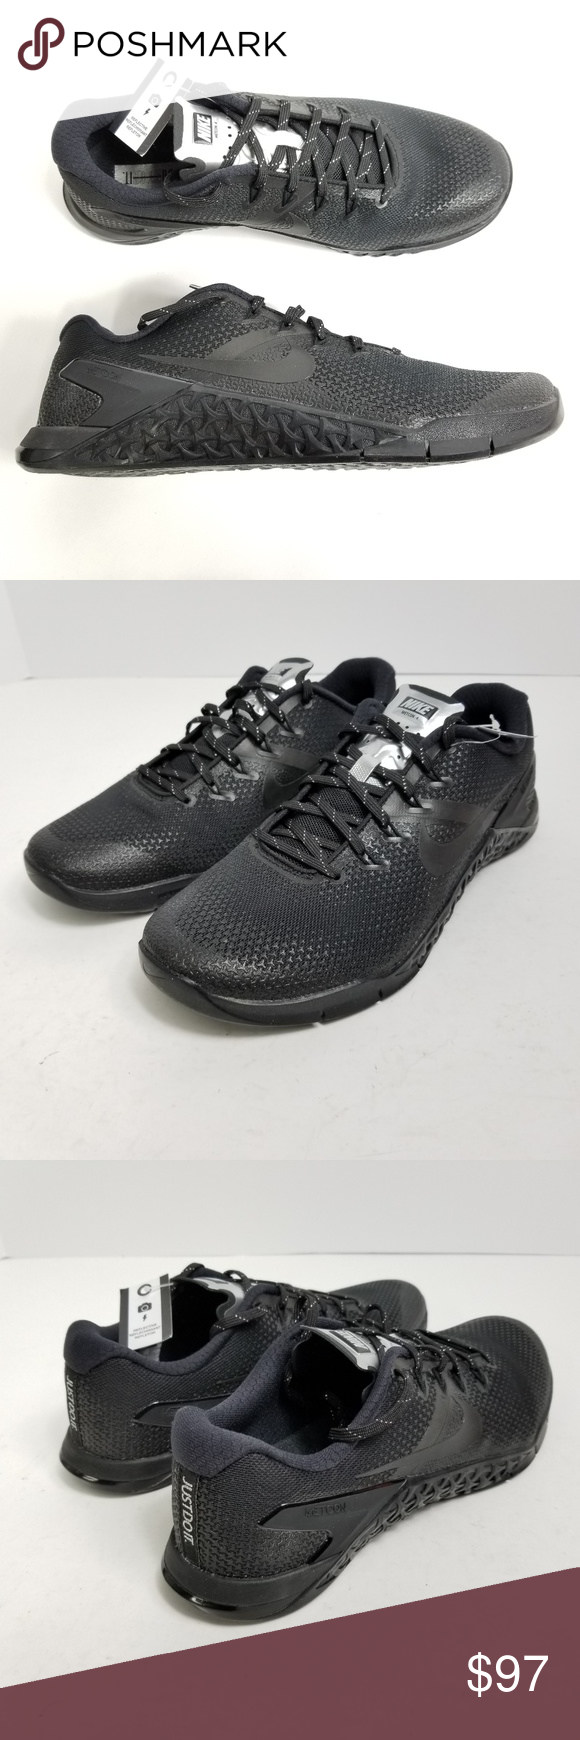 5ecde506782c Nike Women Metcon 4 Selfie Training Shoes 9 9.5 10 Nike Womens Metcon 4  Selfie Training Shoes Sz 9 9.5 10 Black Chrome AH8194 001 New without box!